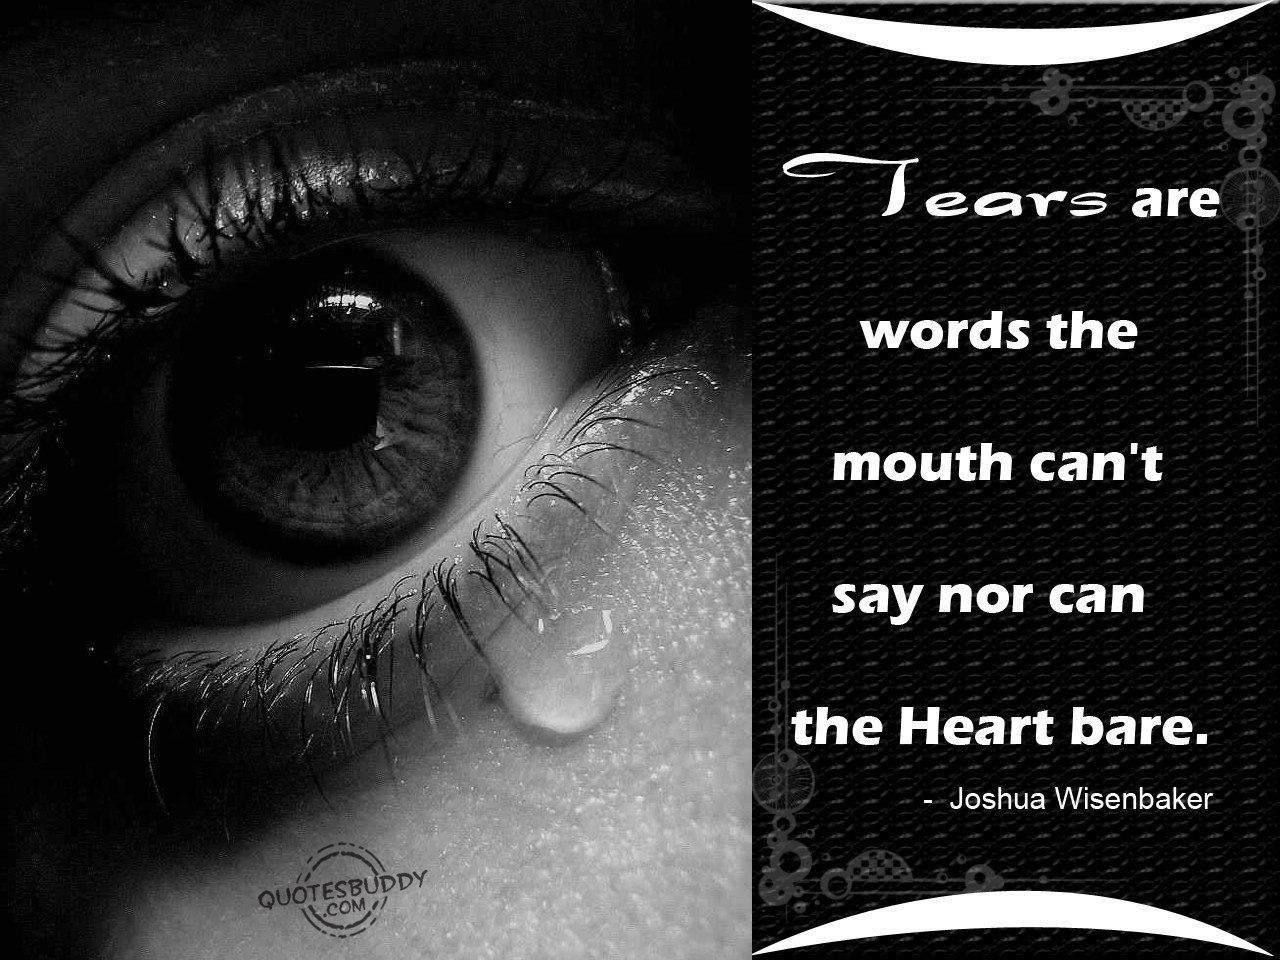 Sad Quotes About Death: Sad Quotes About Death. QuotesGram